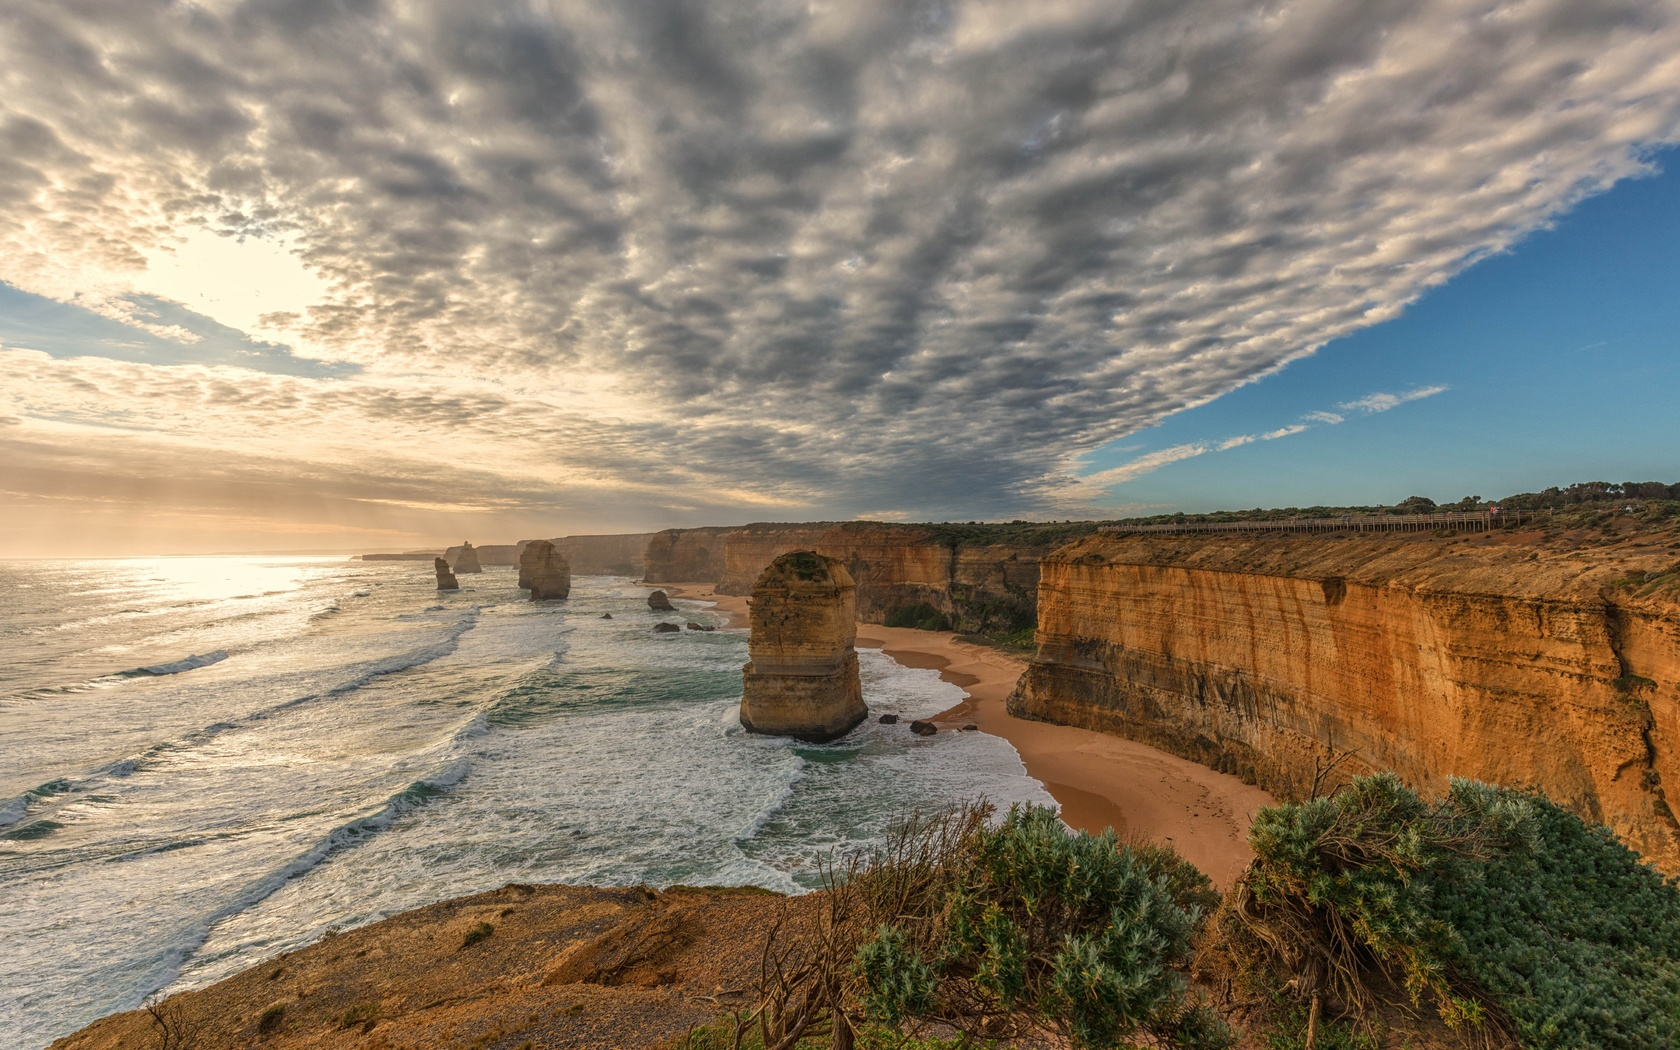 небо, облака, океан, скалы, побережье, виктория, австралия, australia, victoria, port campbell national park, twelve apostl